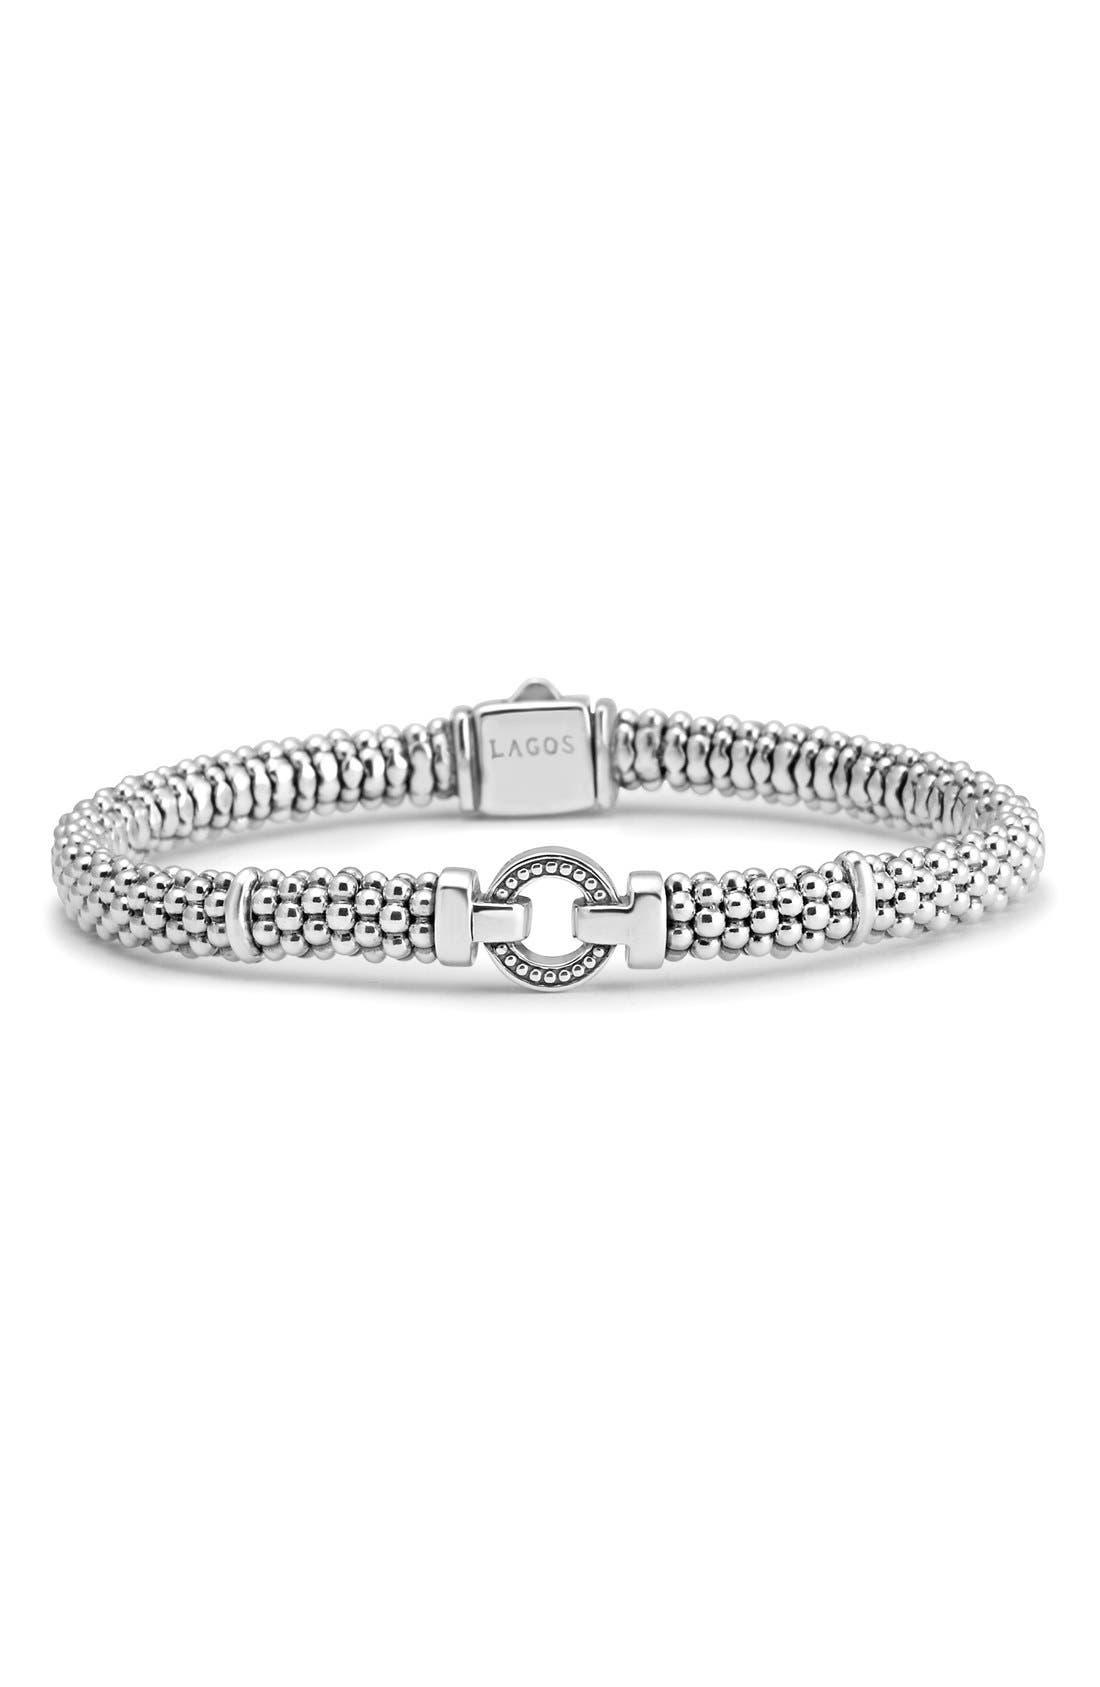 Alternate Image 1 Selected - LAGOS Enso Boxed Circle Station Caviar Rope Bracelet